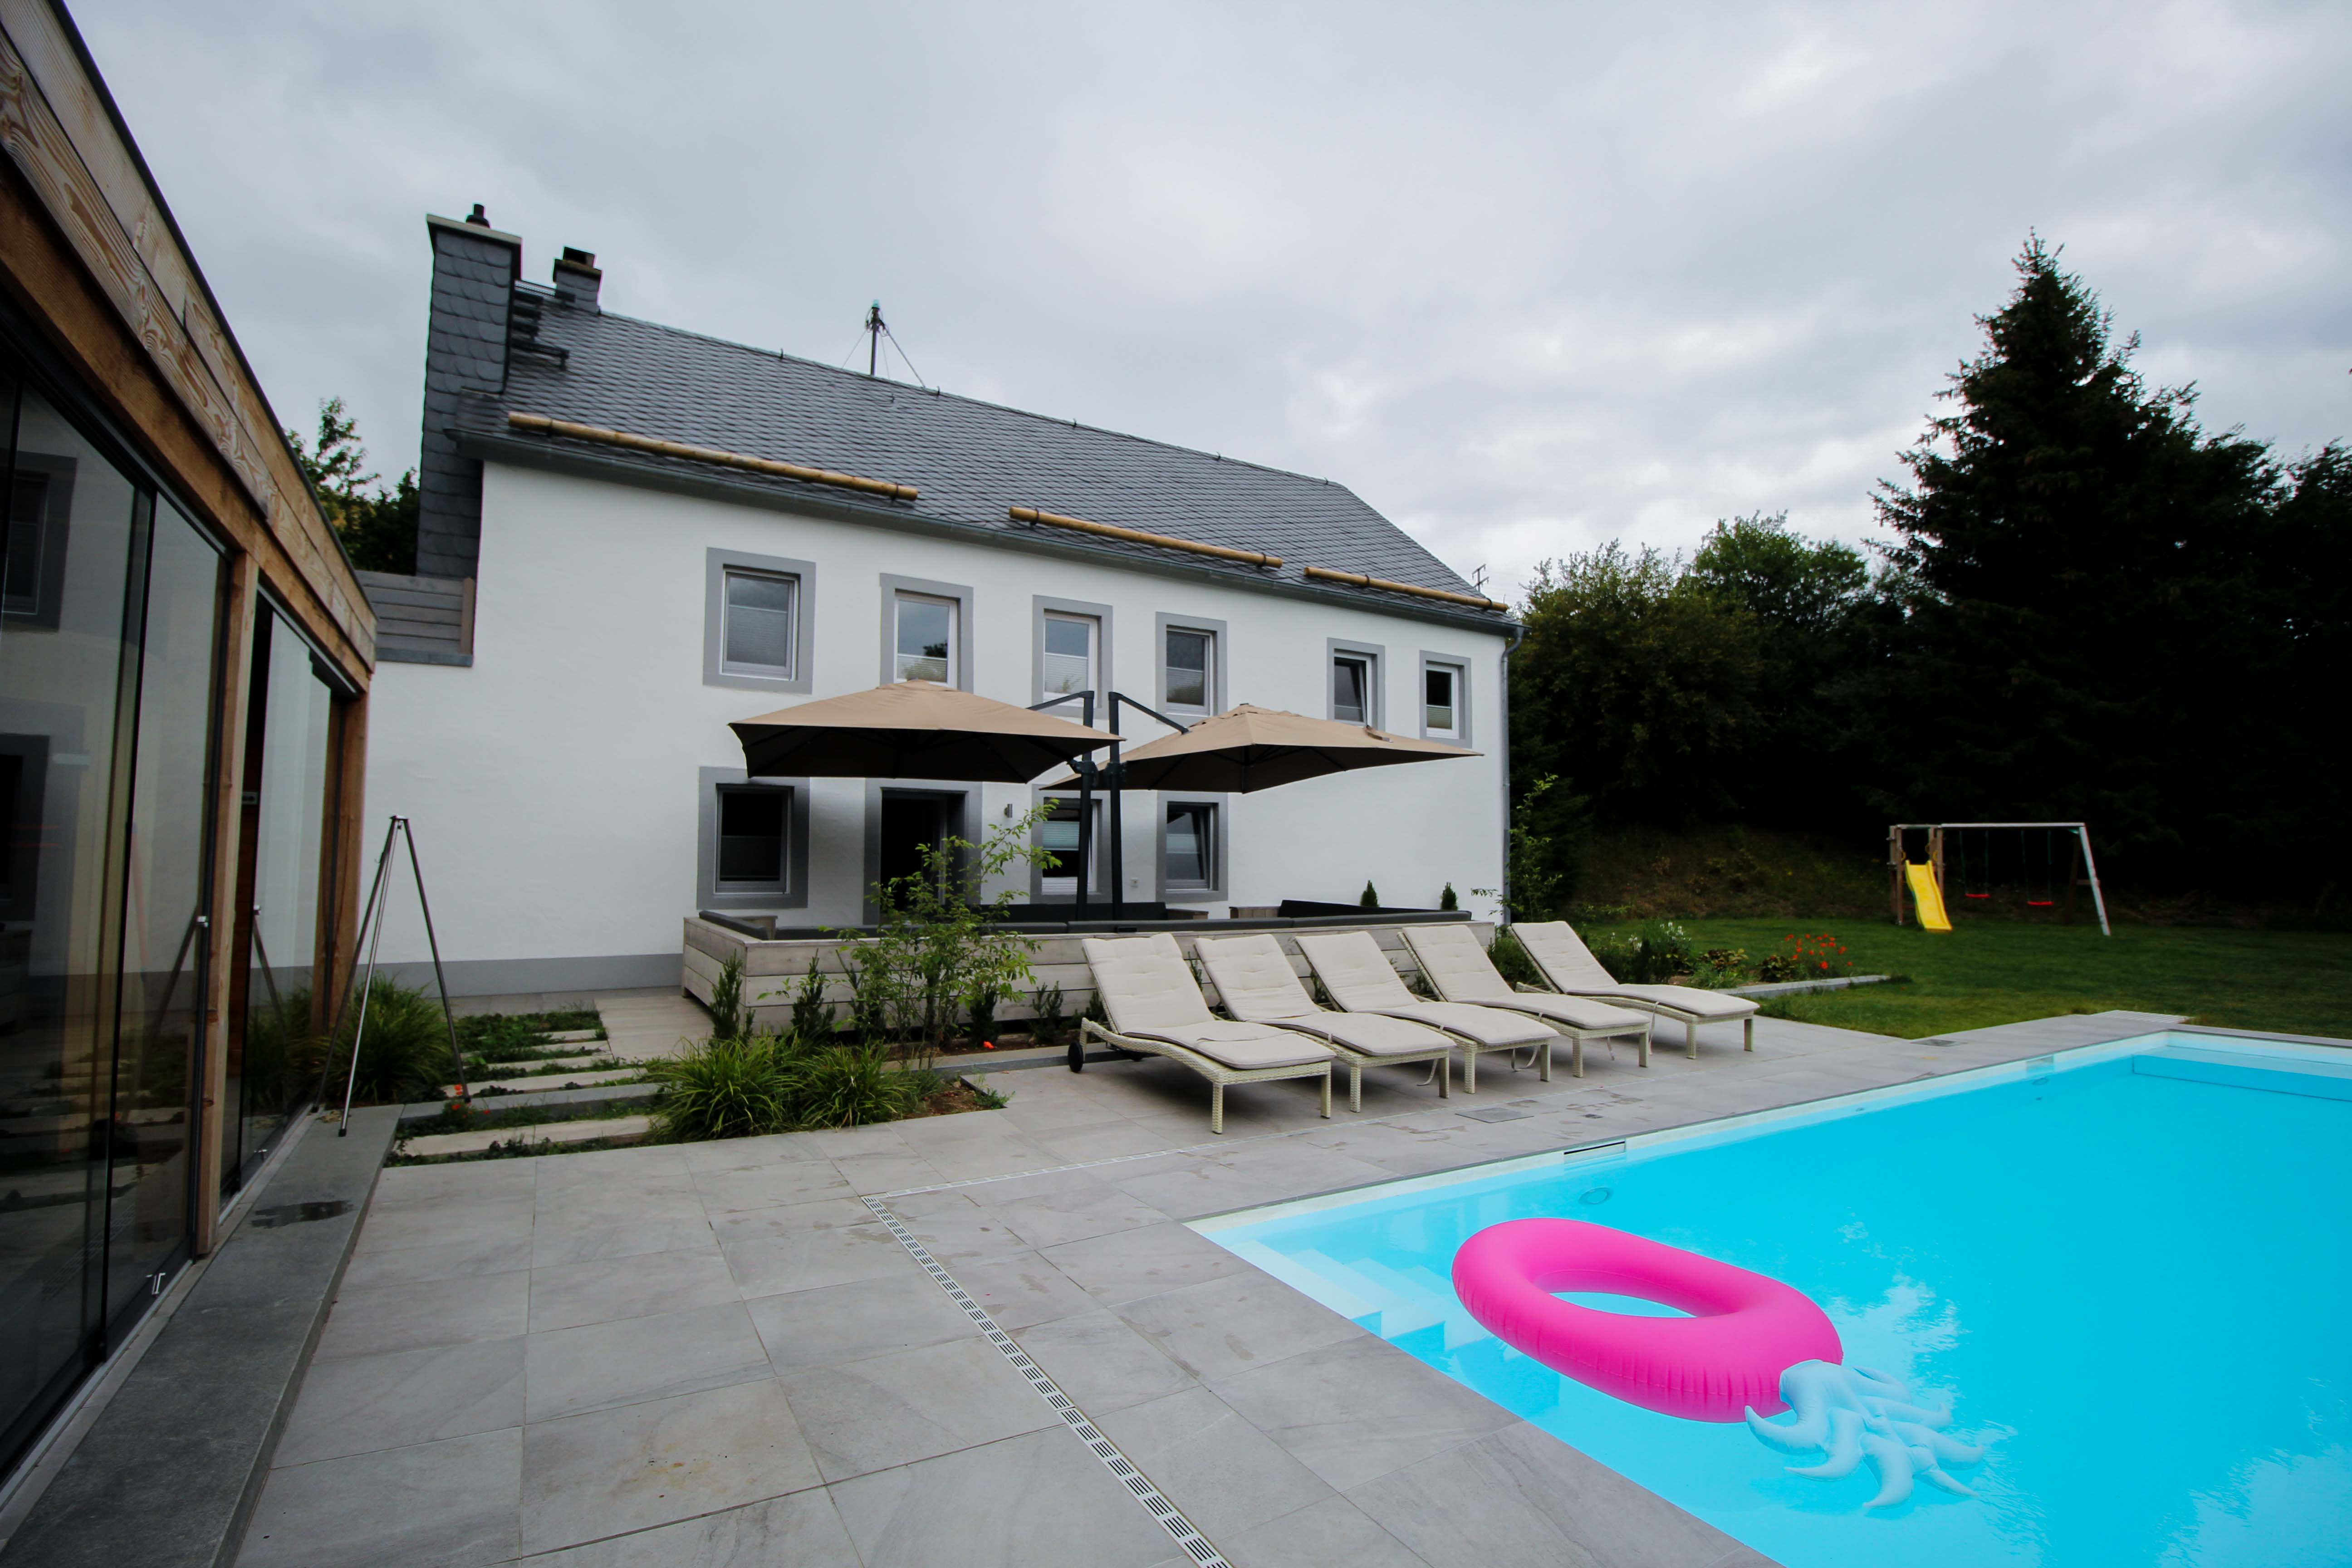 Geburtstagsfeier Location Villa Eifel Deutschland besondere Location JGA Villa mieten Muxerath Villa Steinshof Hasenhof Pool 2